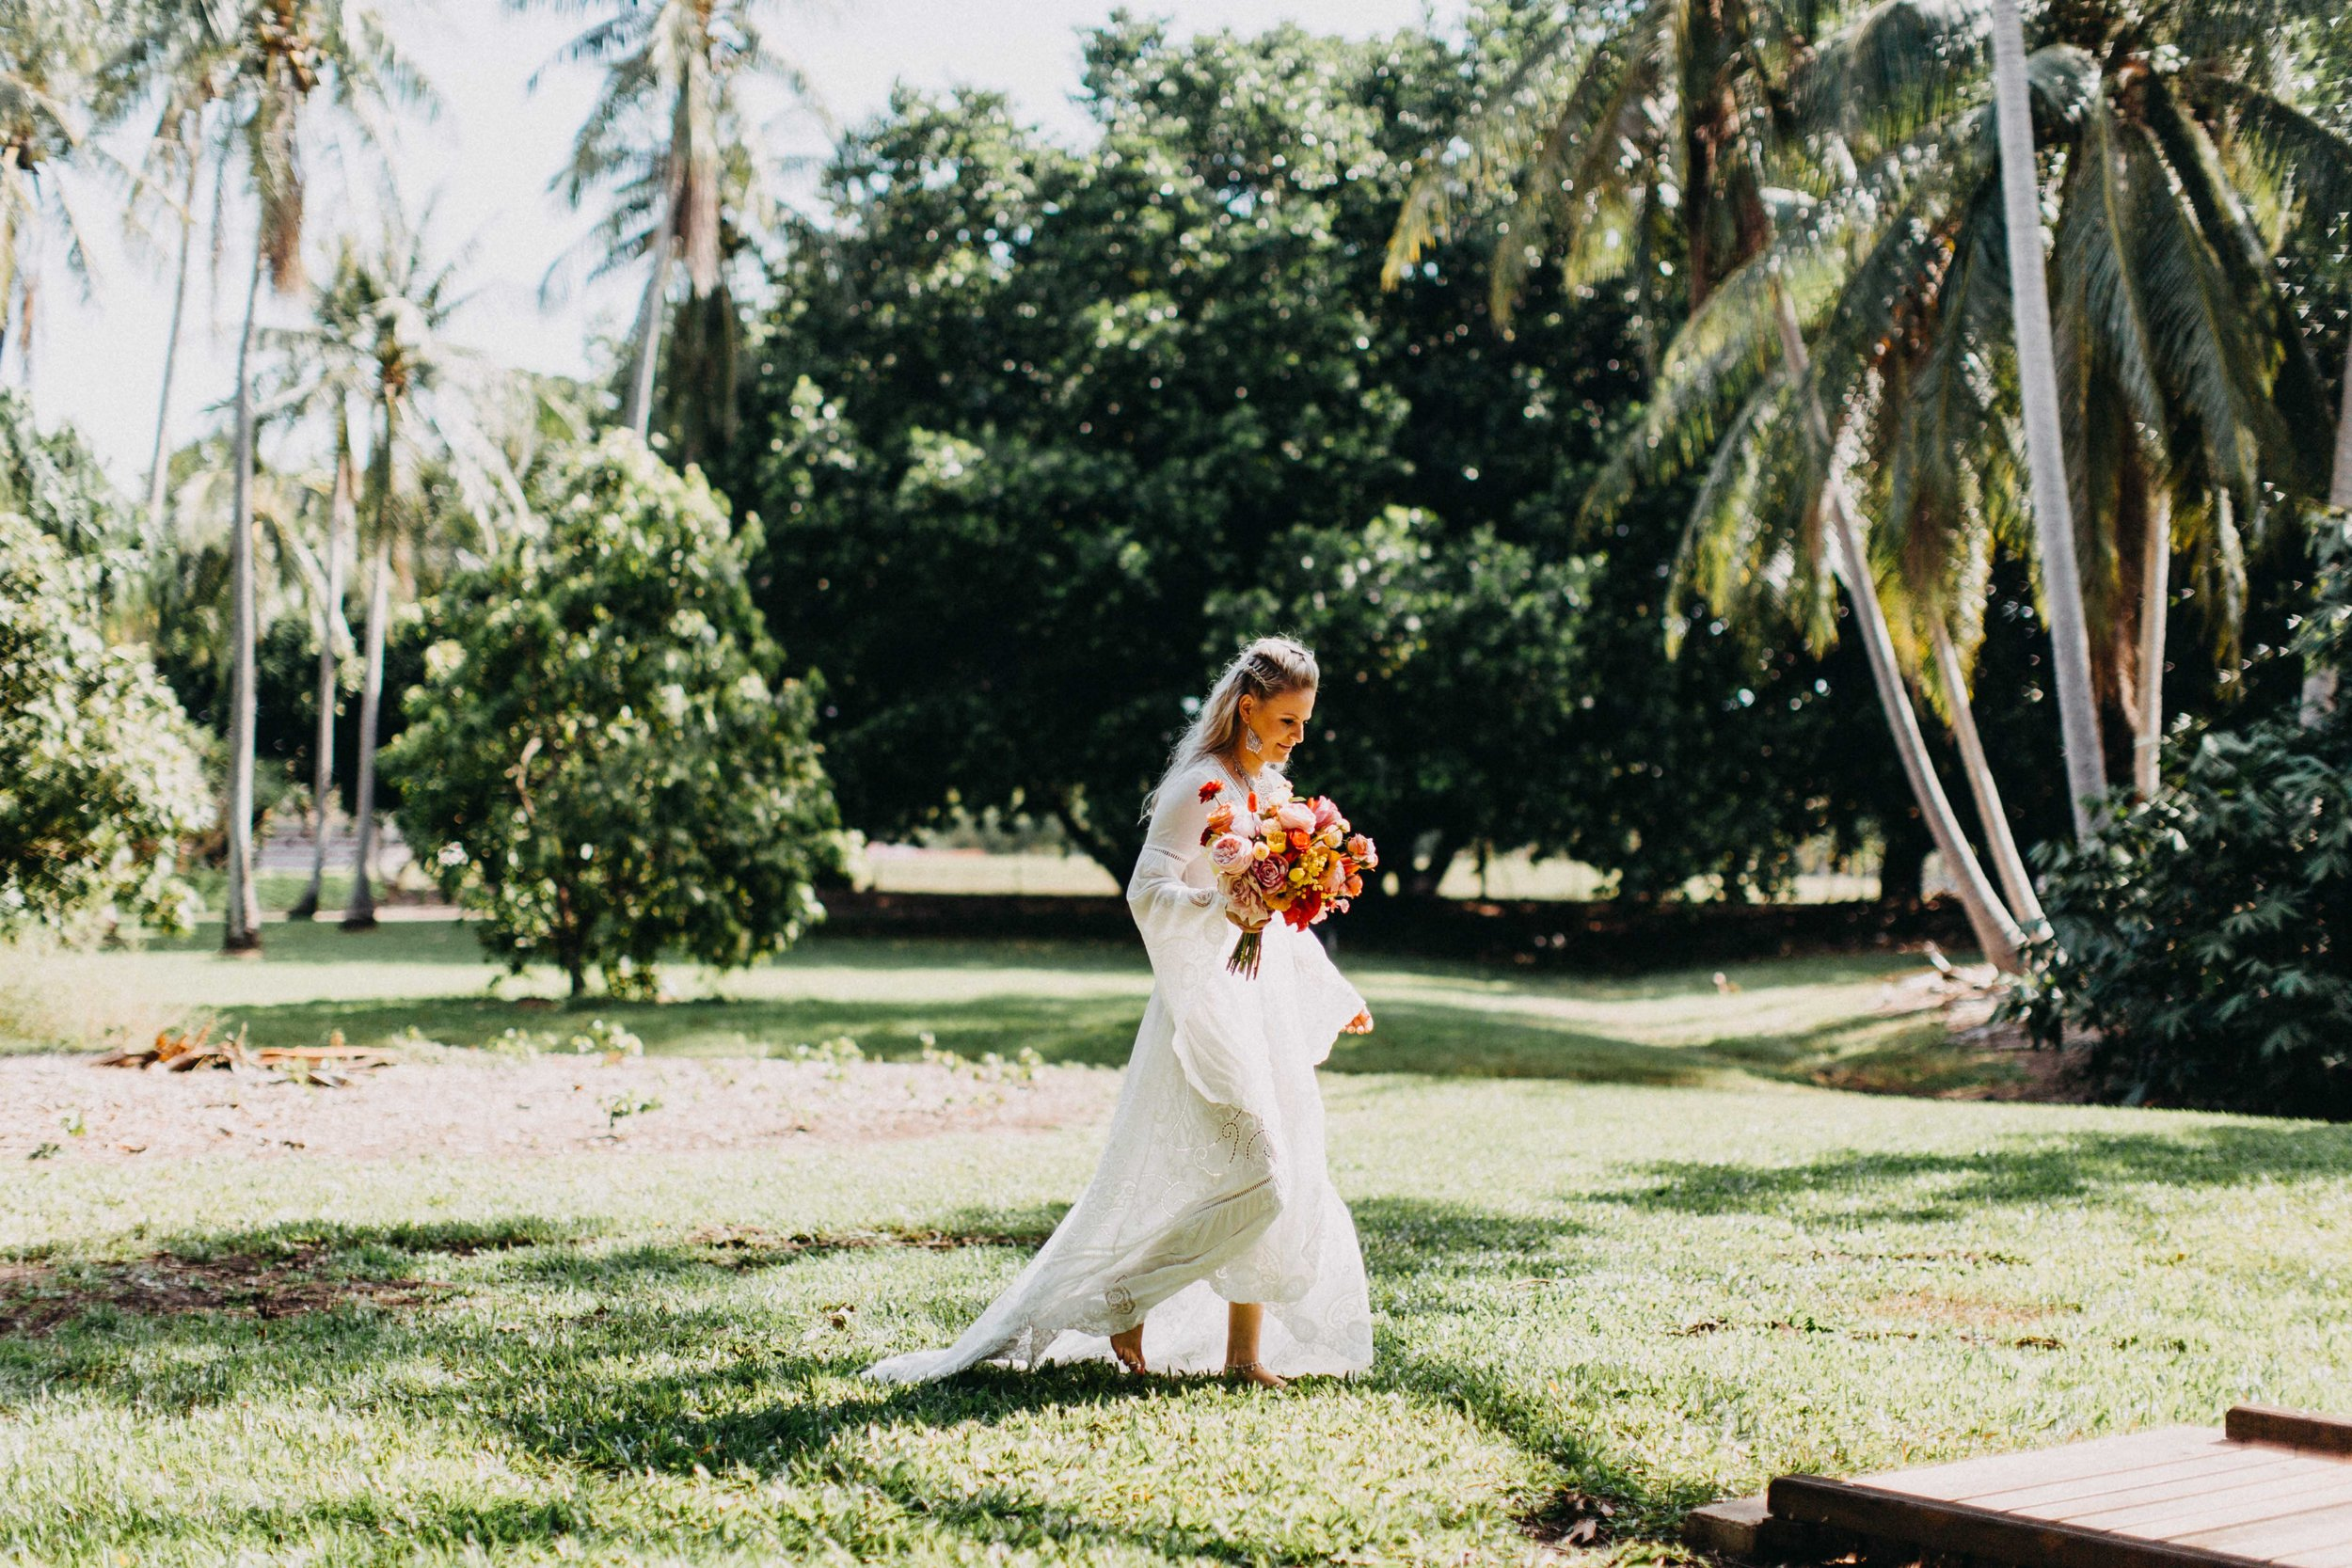 darwin-elopement-wedding-beach-camden-photography-www.emilyobrienphotography.net-2.jpg